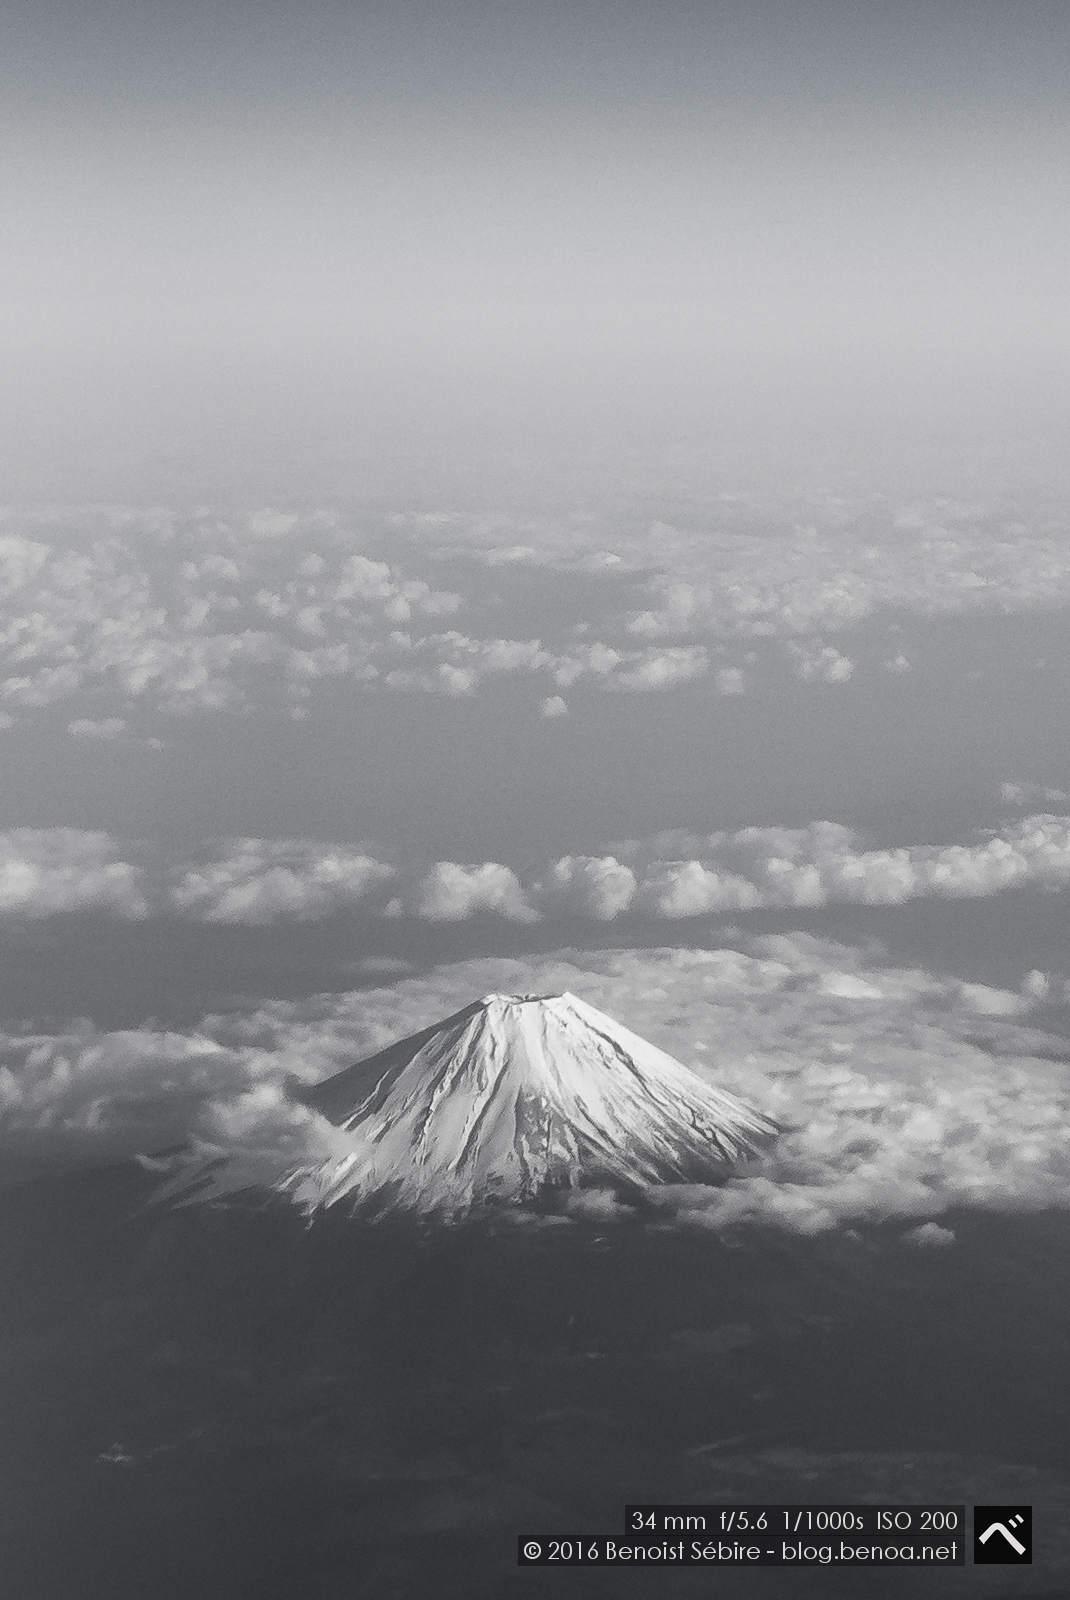 Snowcapped Fujisan